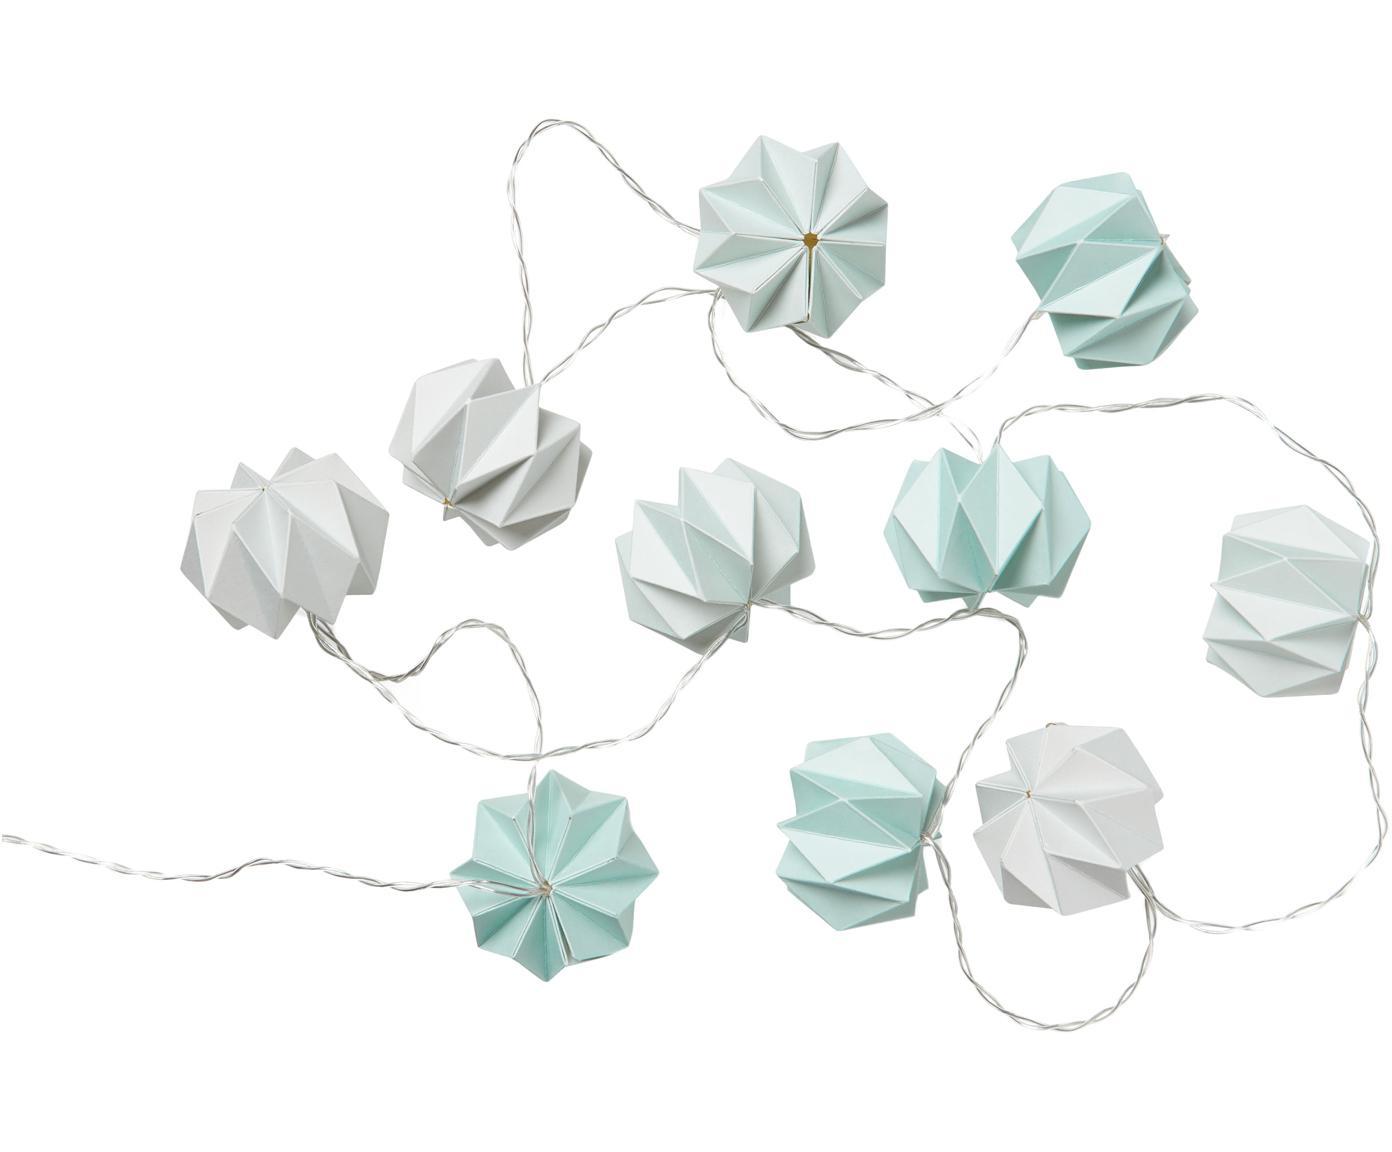 Lichtslinger Origami, Papier, Blauwtinten, L 200 cm